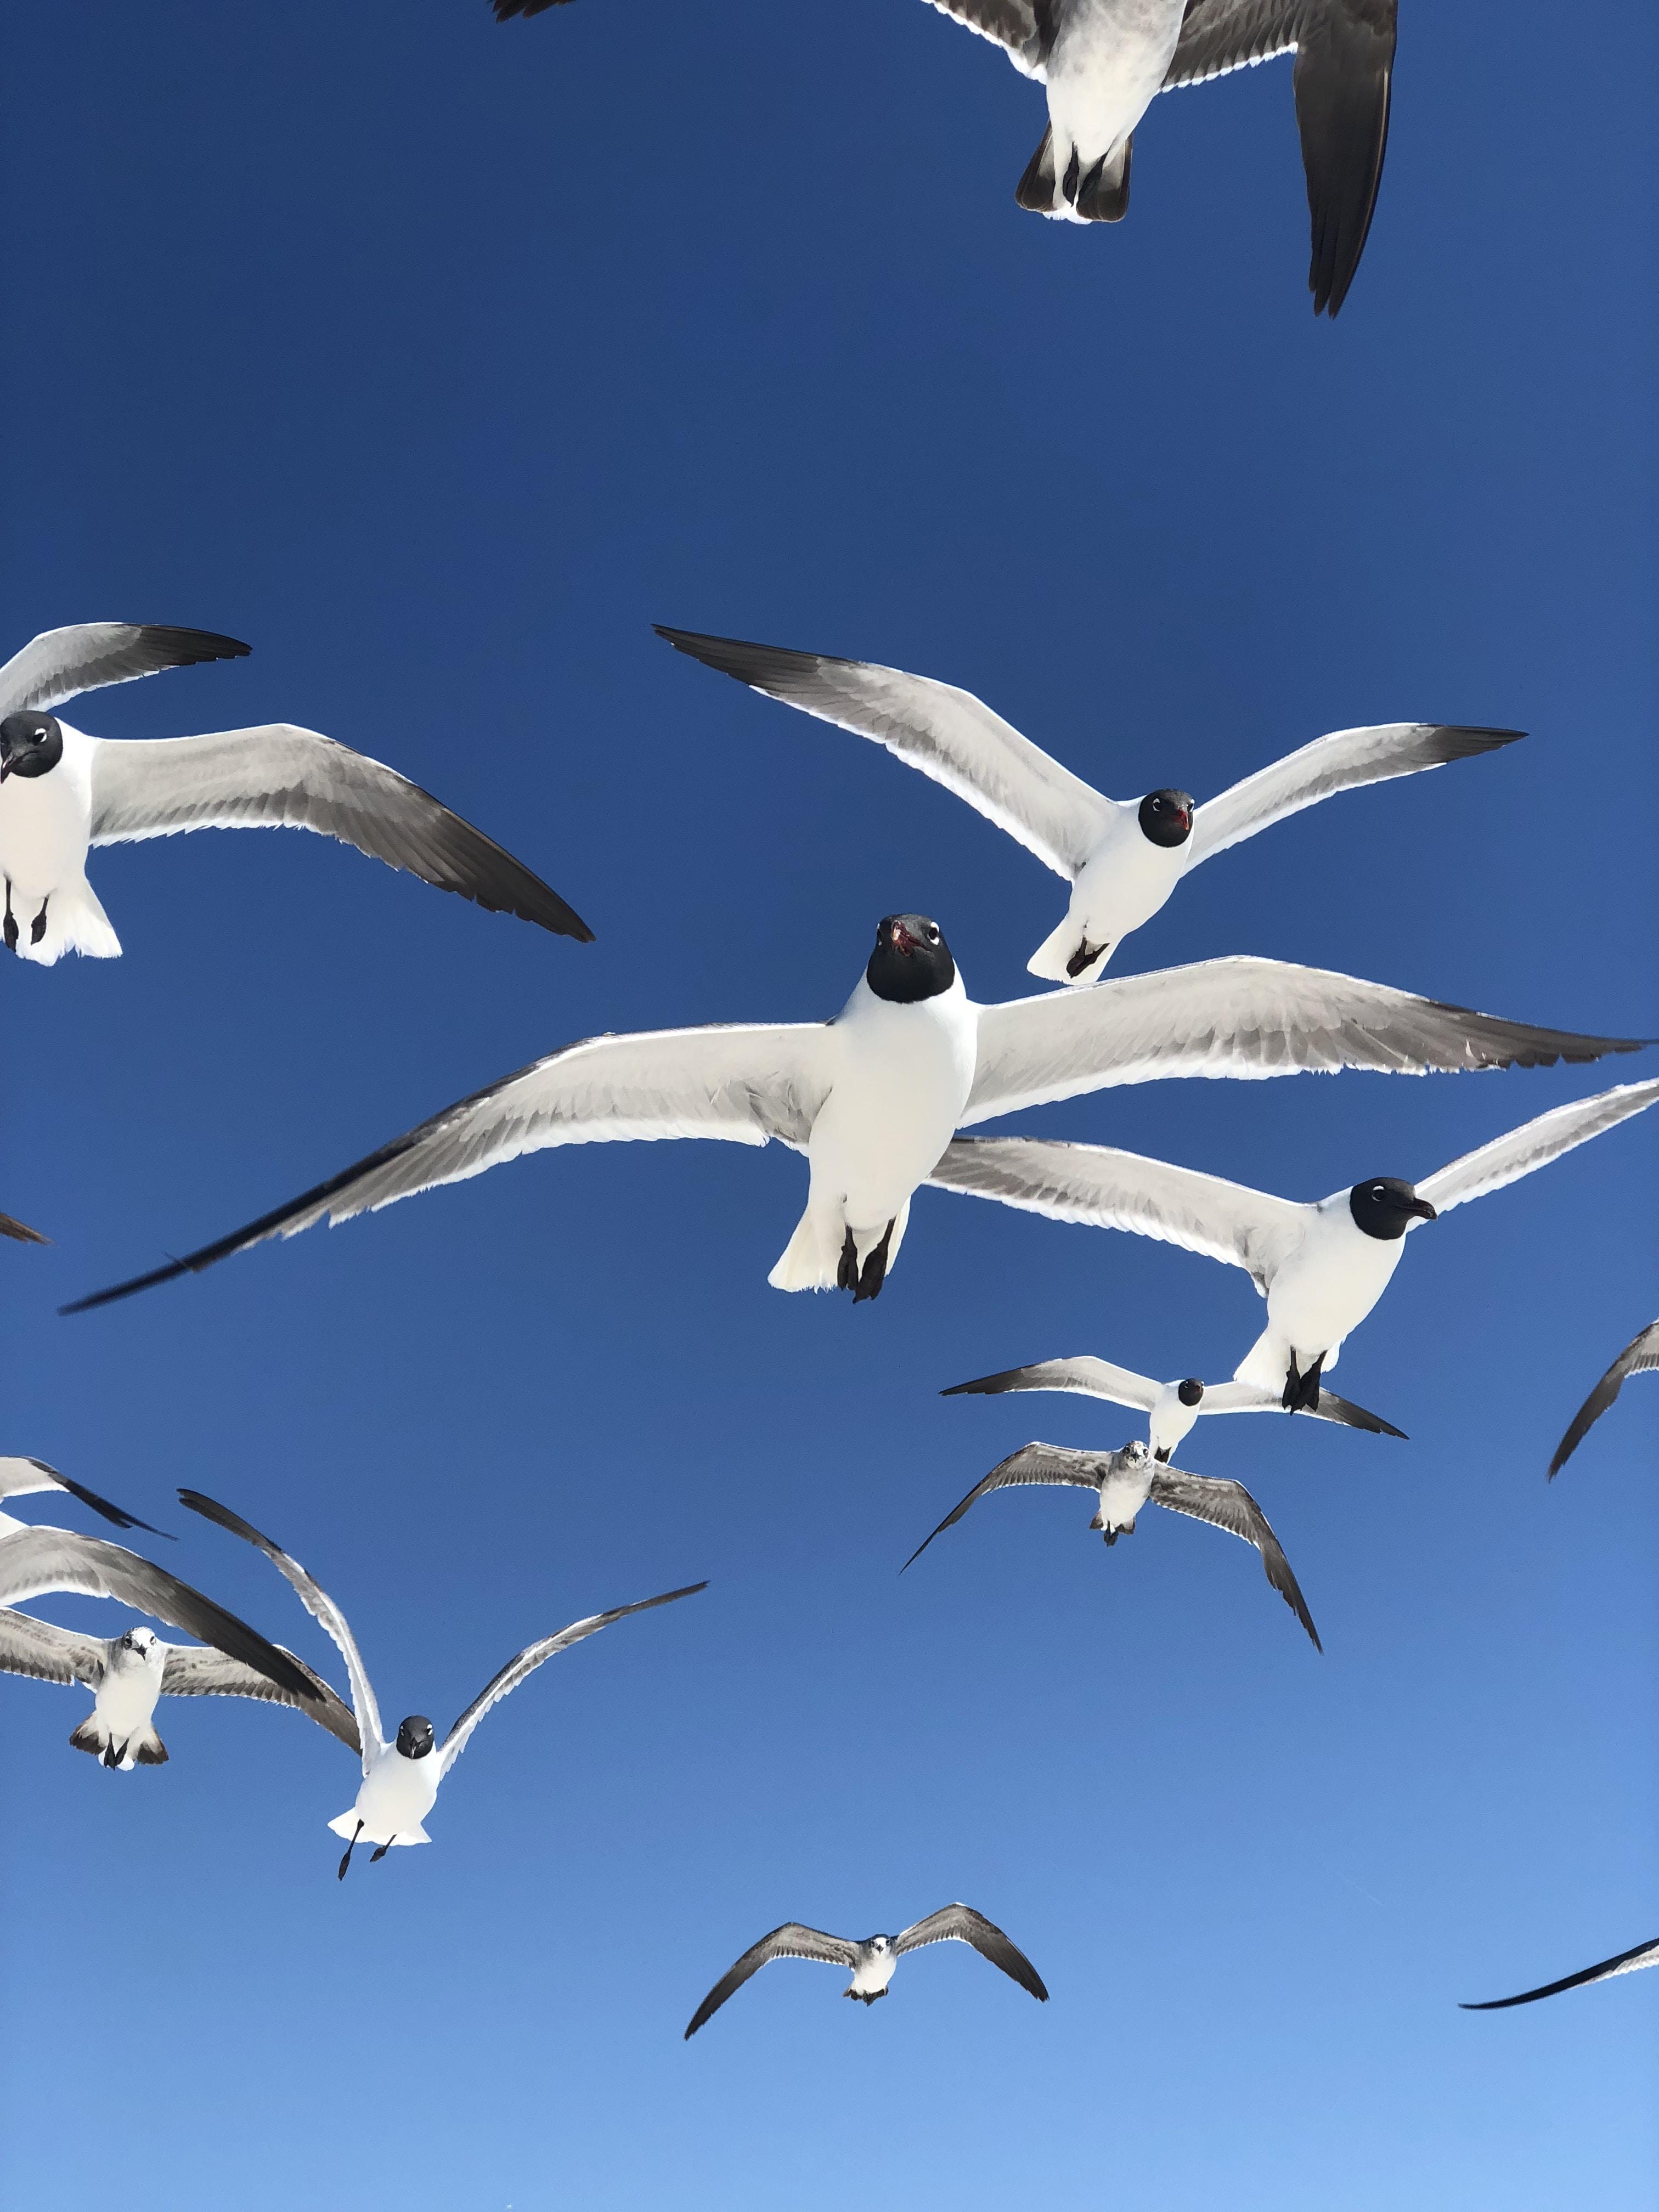 flock of white bird on air